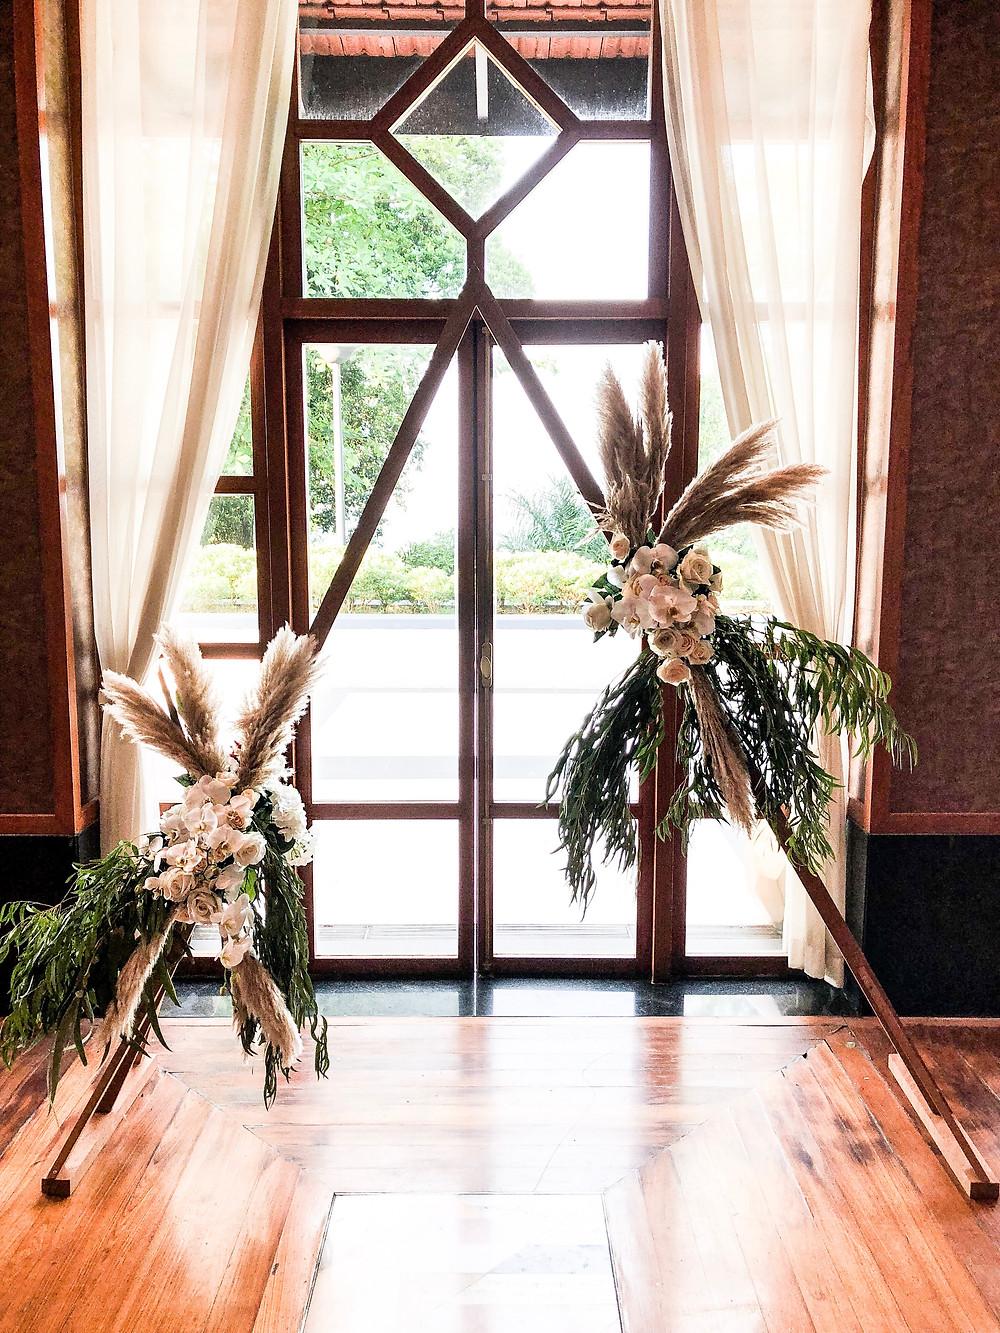 Triangular Wedding Arch Backdrop with Pampas Singapore Florist